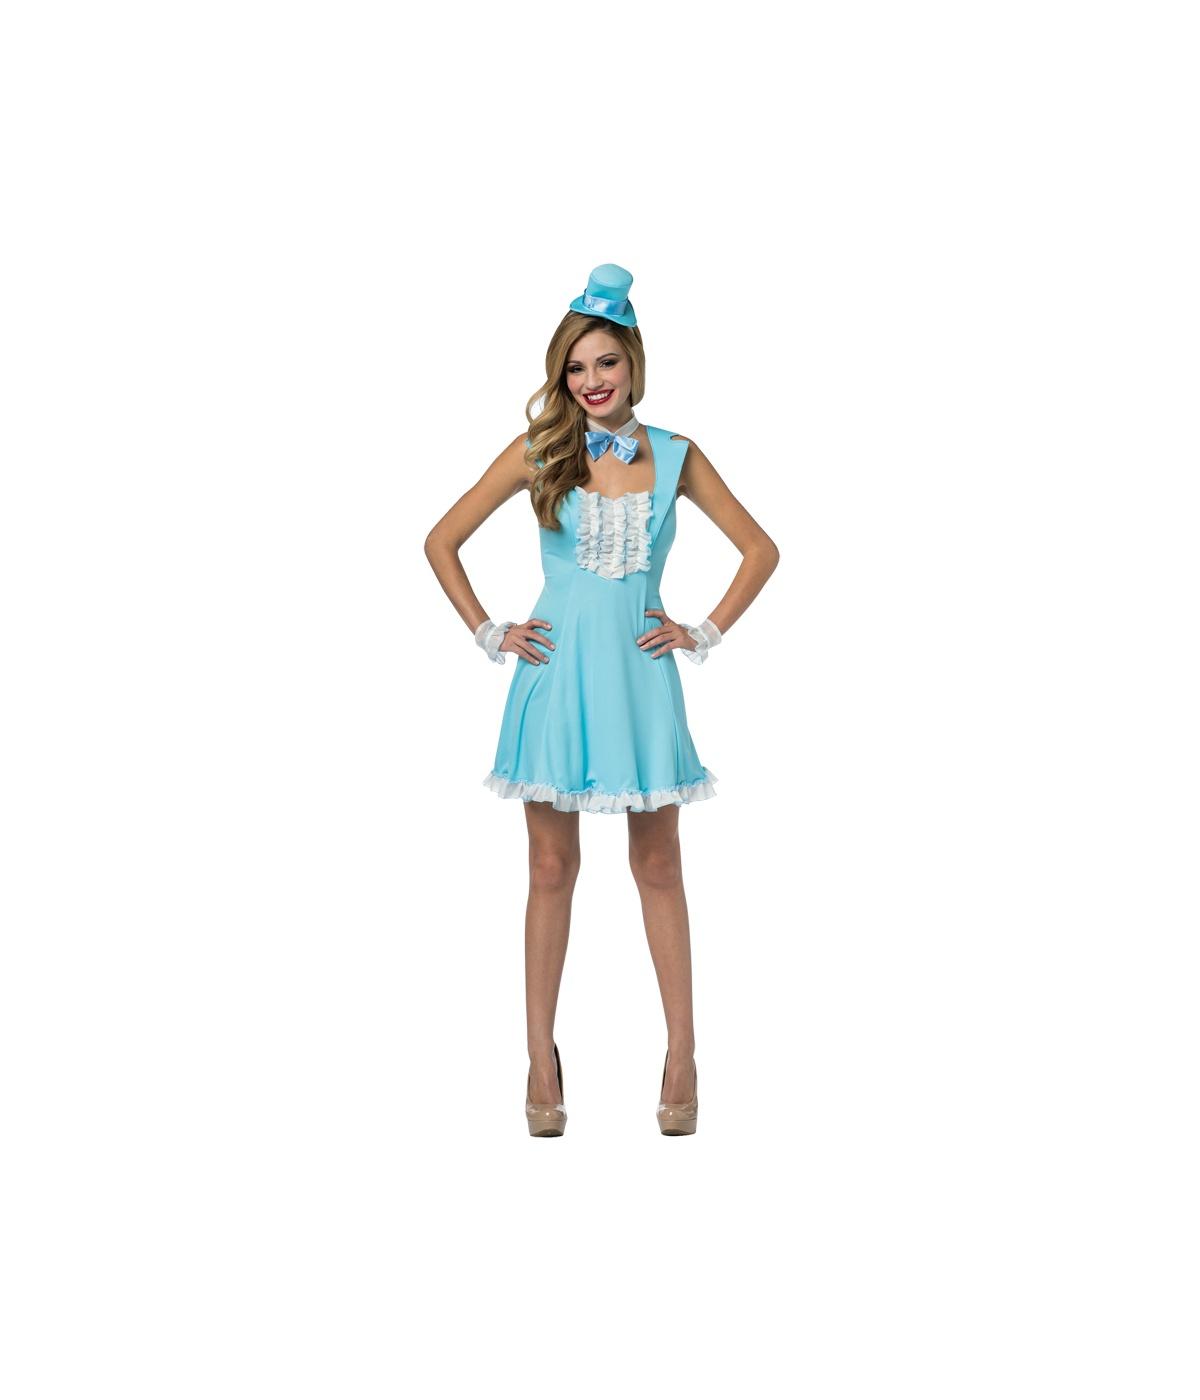 dumb and dumber harry dunne charity blue womens dress costume